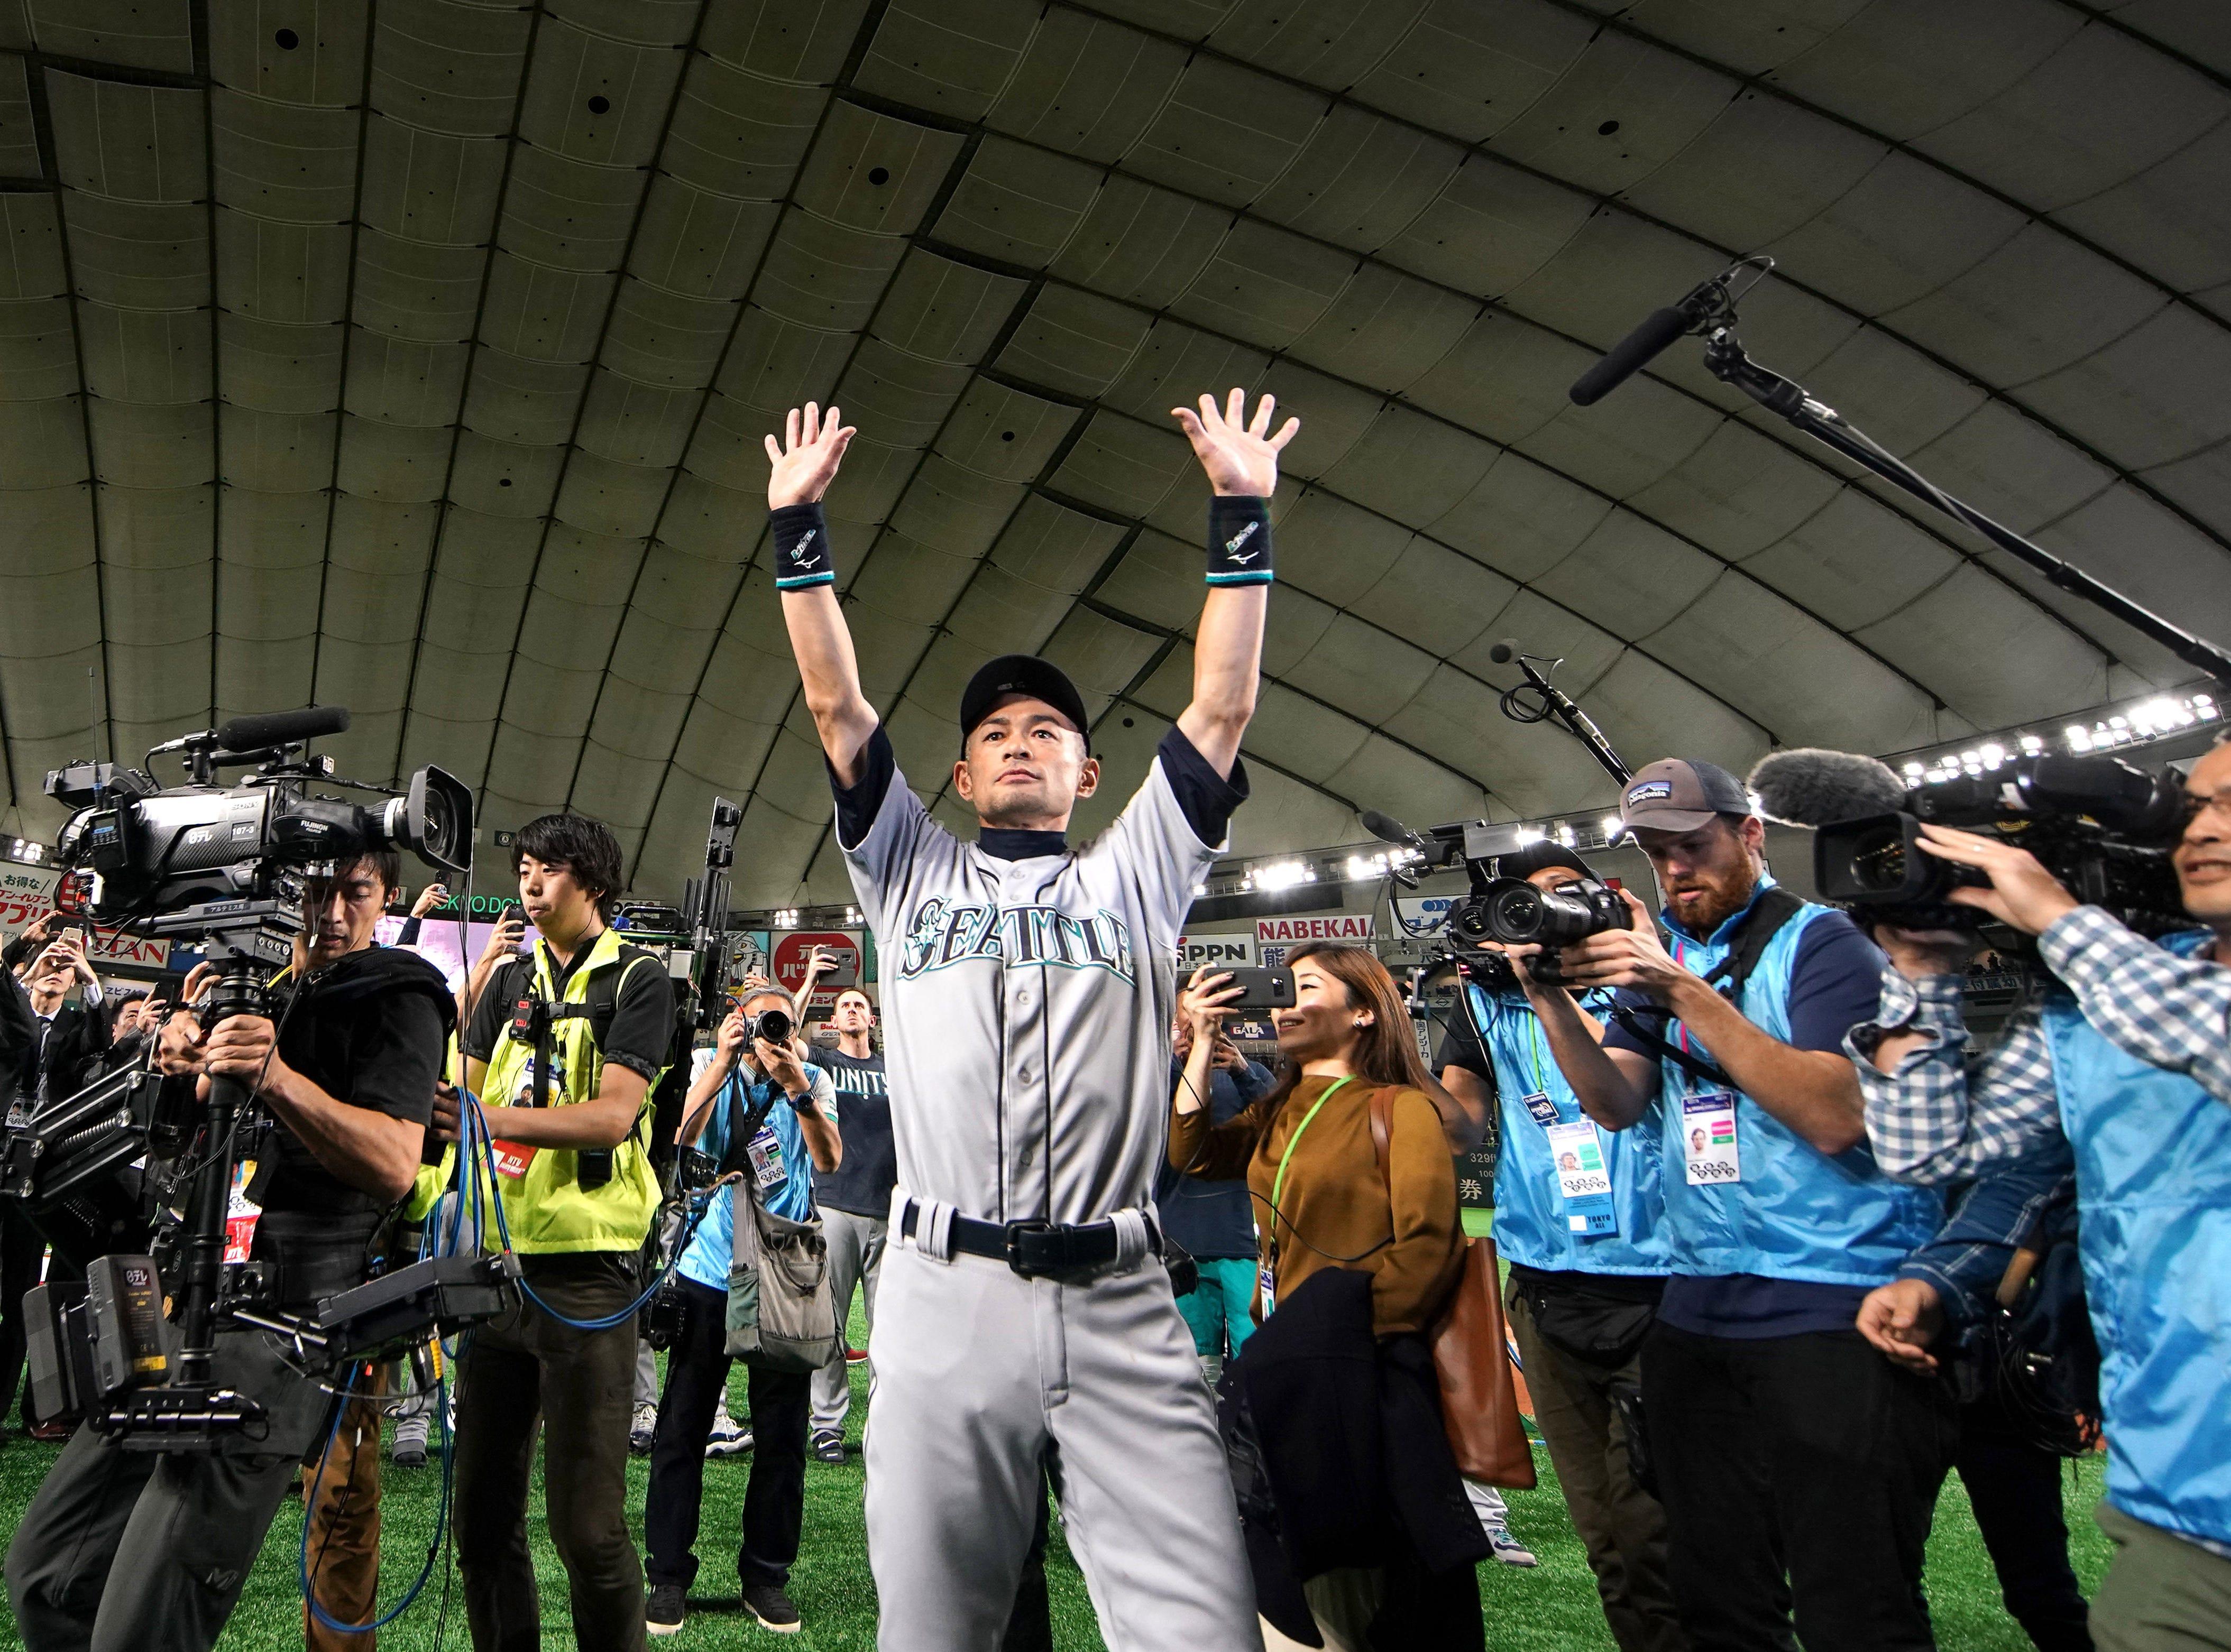 March 21: Ichiro Suzuki waves to fans after Seattle's game against Oakland in Tokyo.